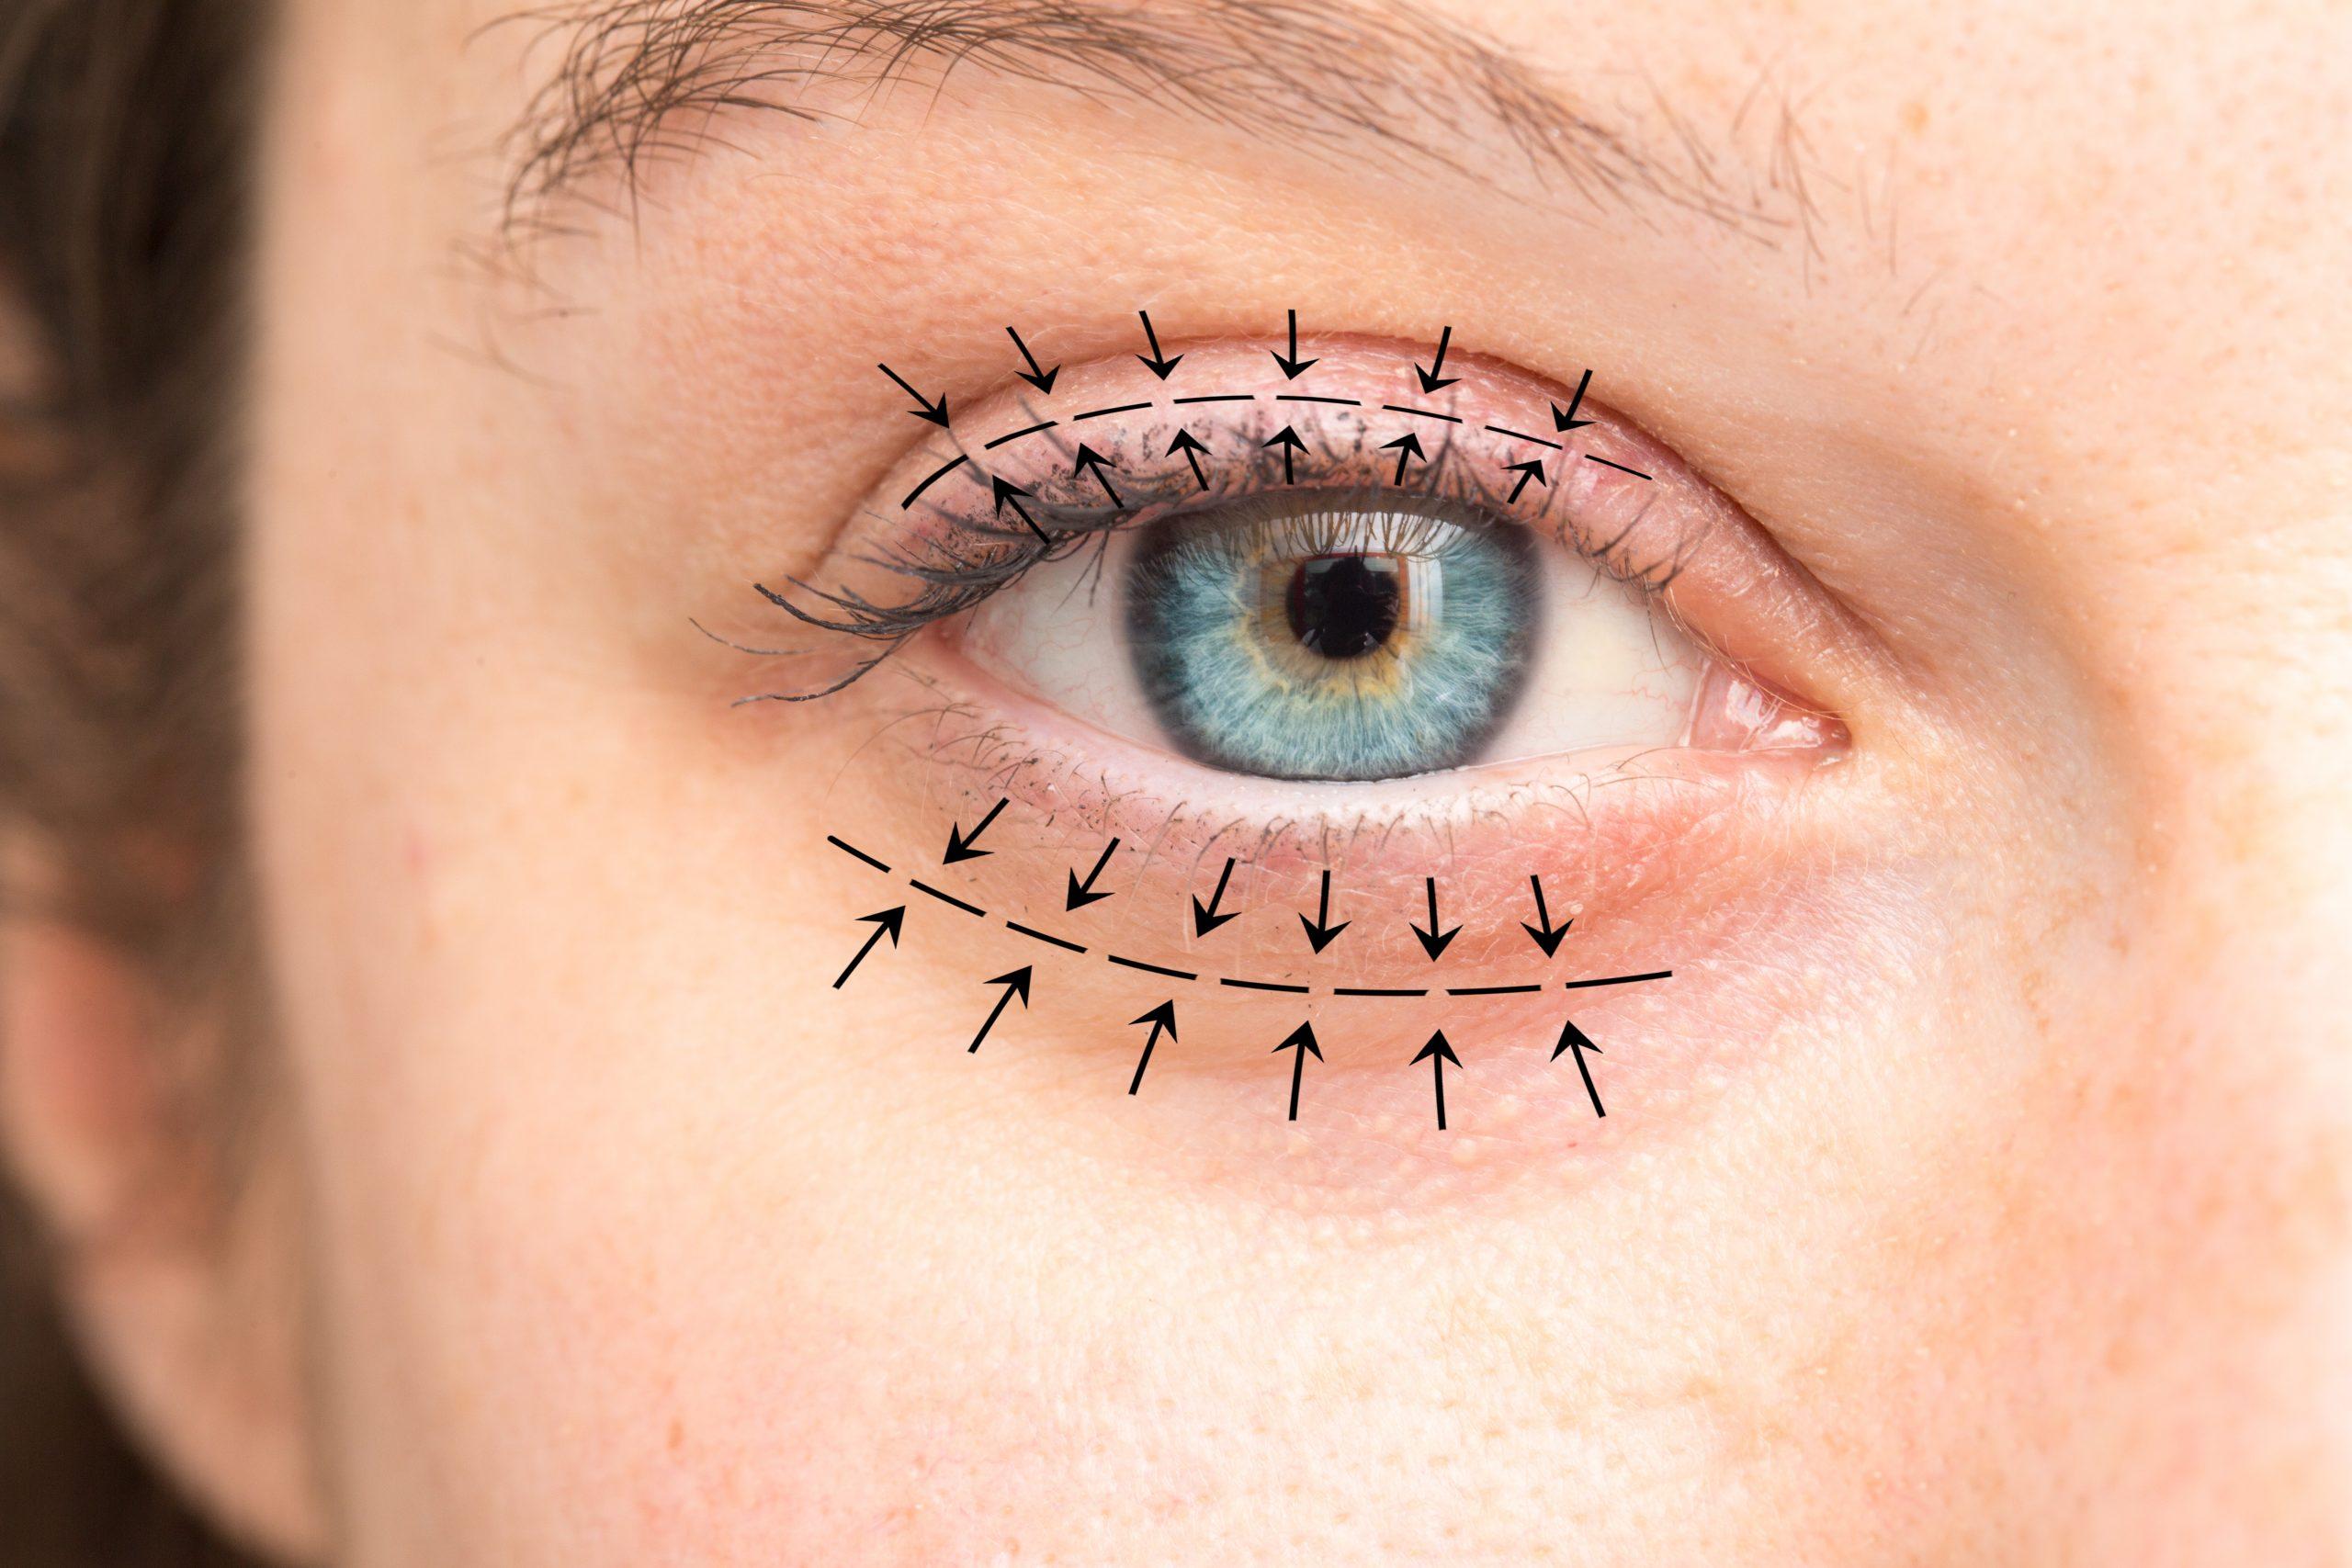 bellecour esthetique chirurgie paupieres blepharoplastie